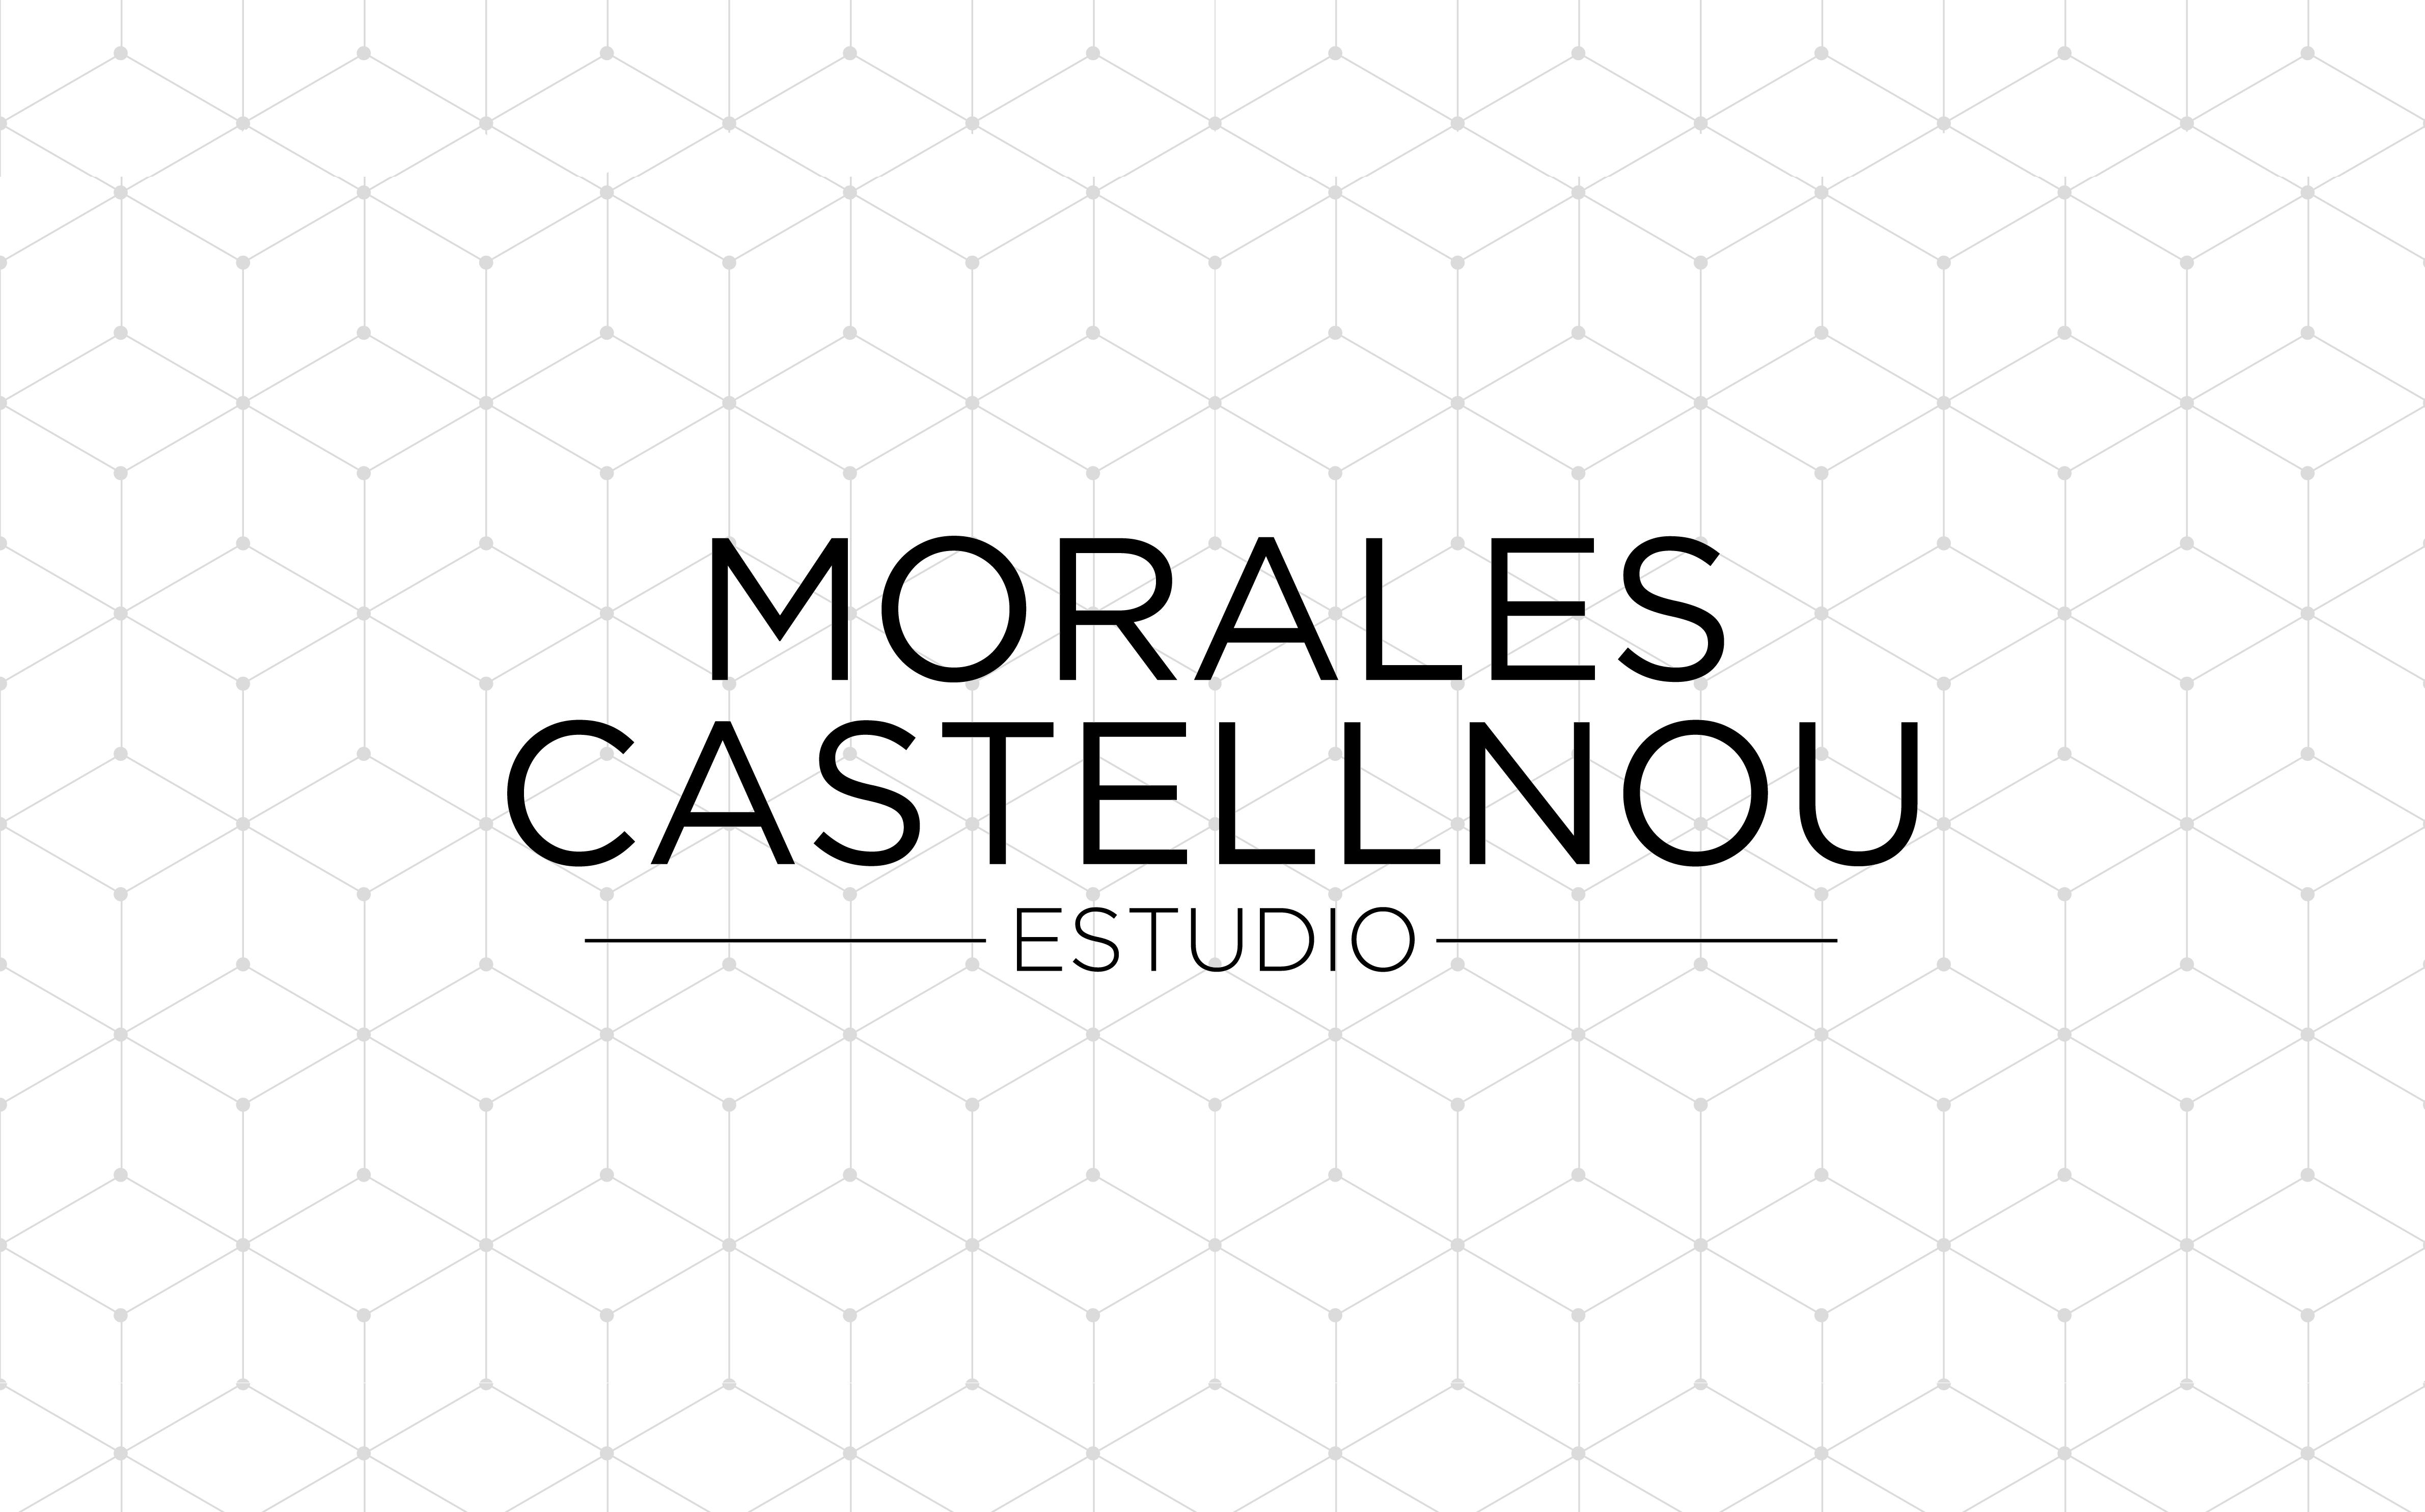 Moralescastellnouestudio